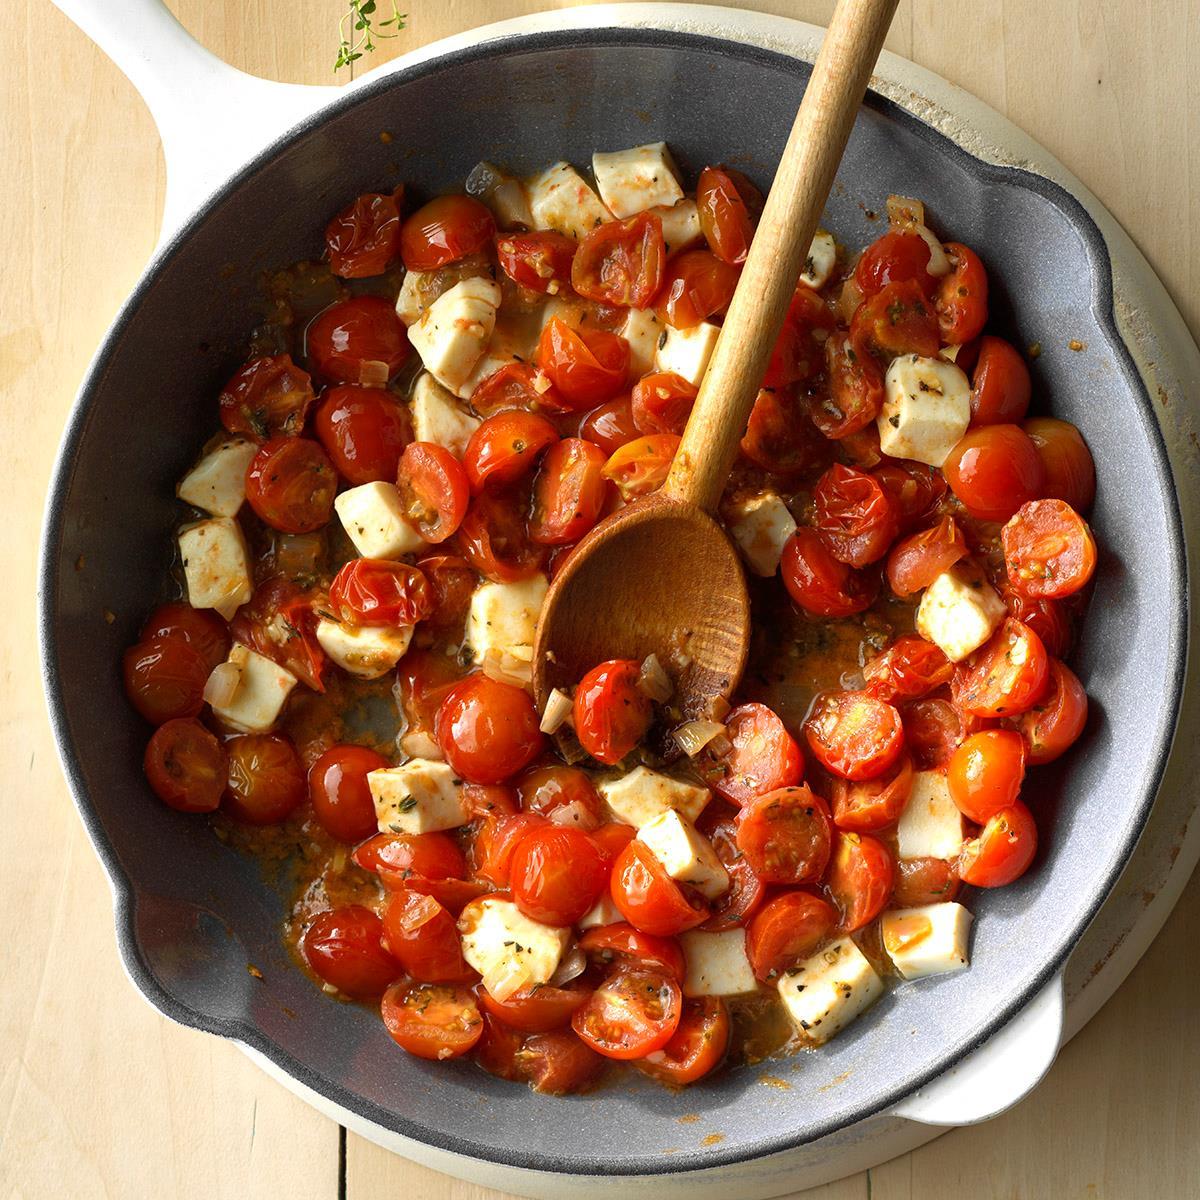 70 Saucy Creamy And Cheesy Italian Christmas Food Recipes: Cherry Tomato Mozzarella Saute Recipe